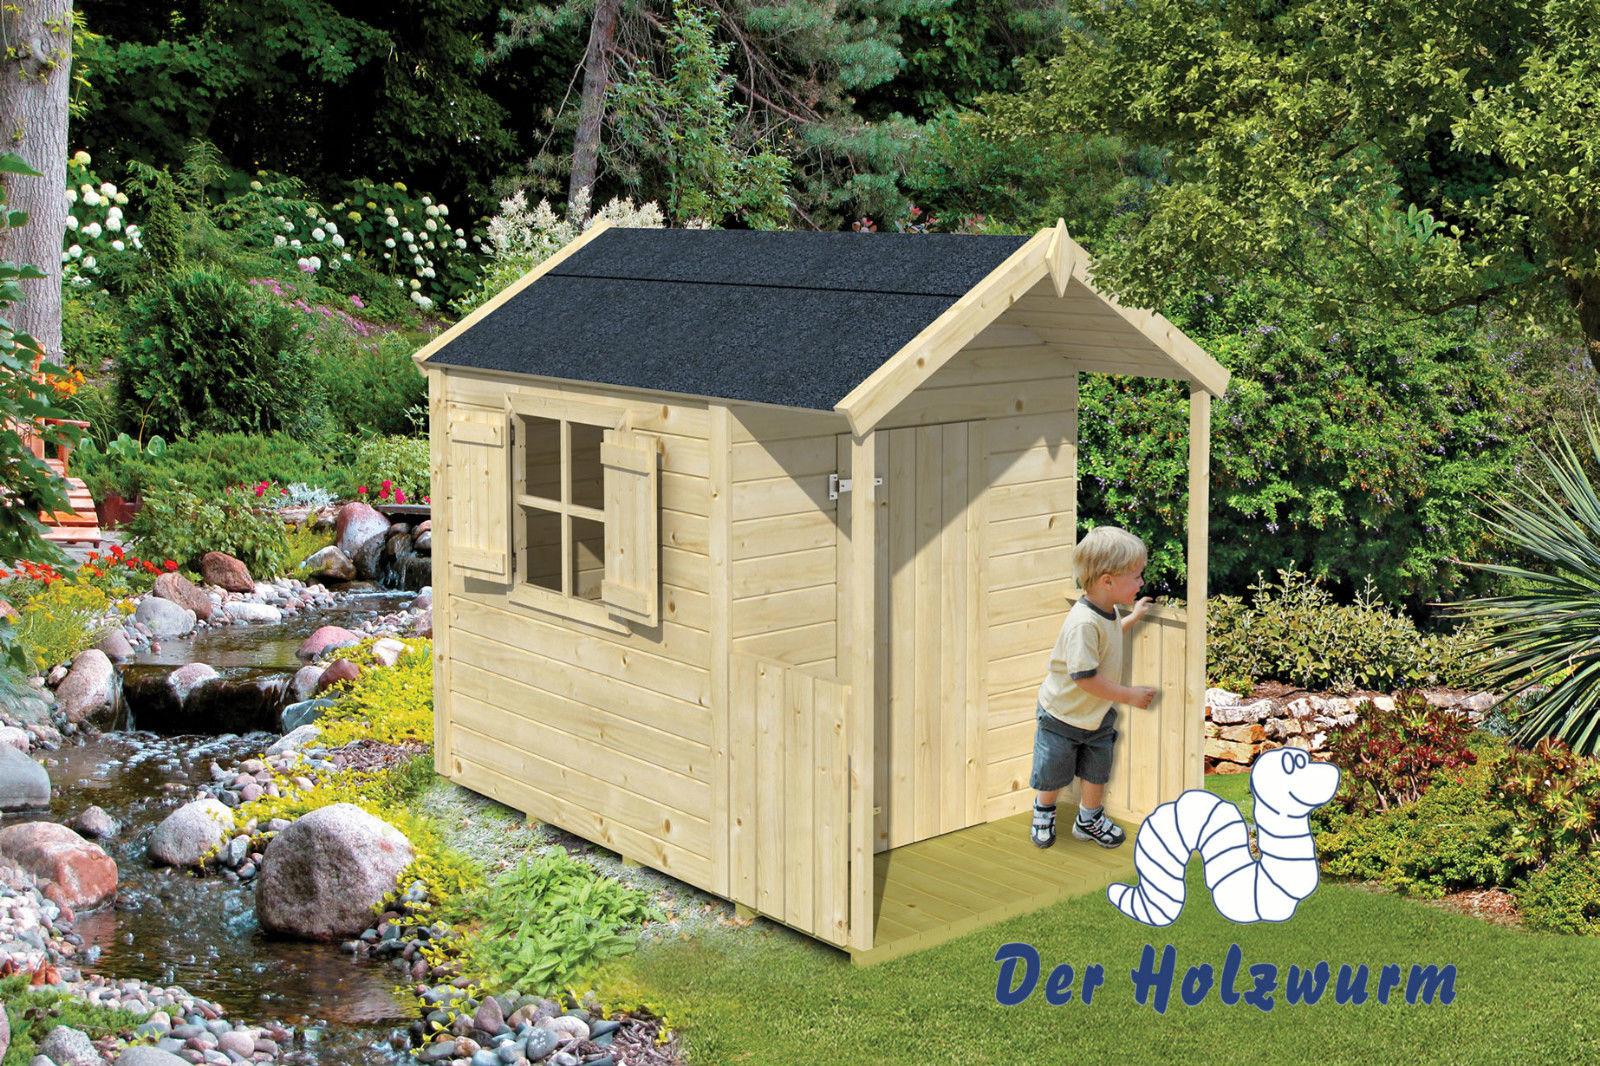 kinderspielhaus pinokkio 16 mm ca 115x180 cm holzwurm obersayn. Black Bedroom Furniture Sets. Home Design Ideas